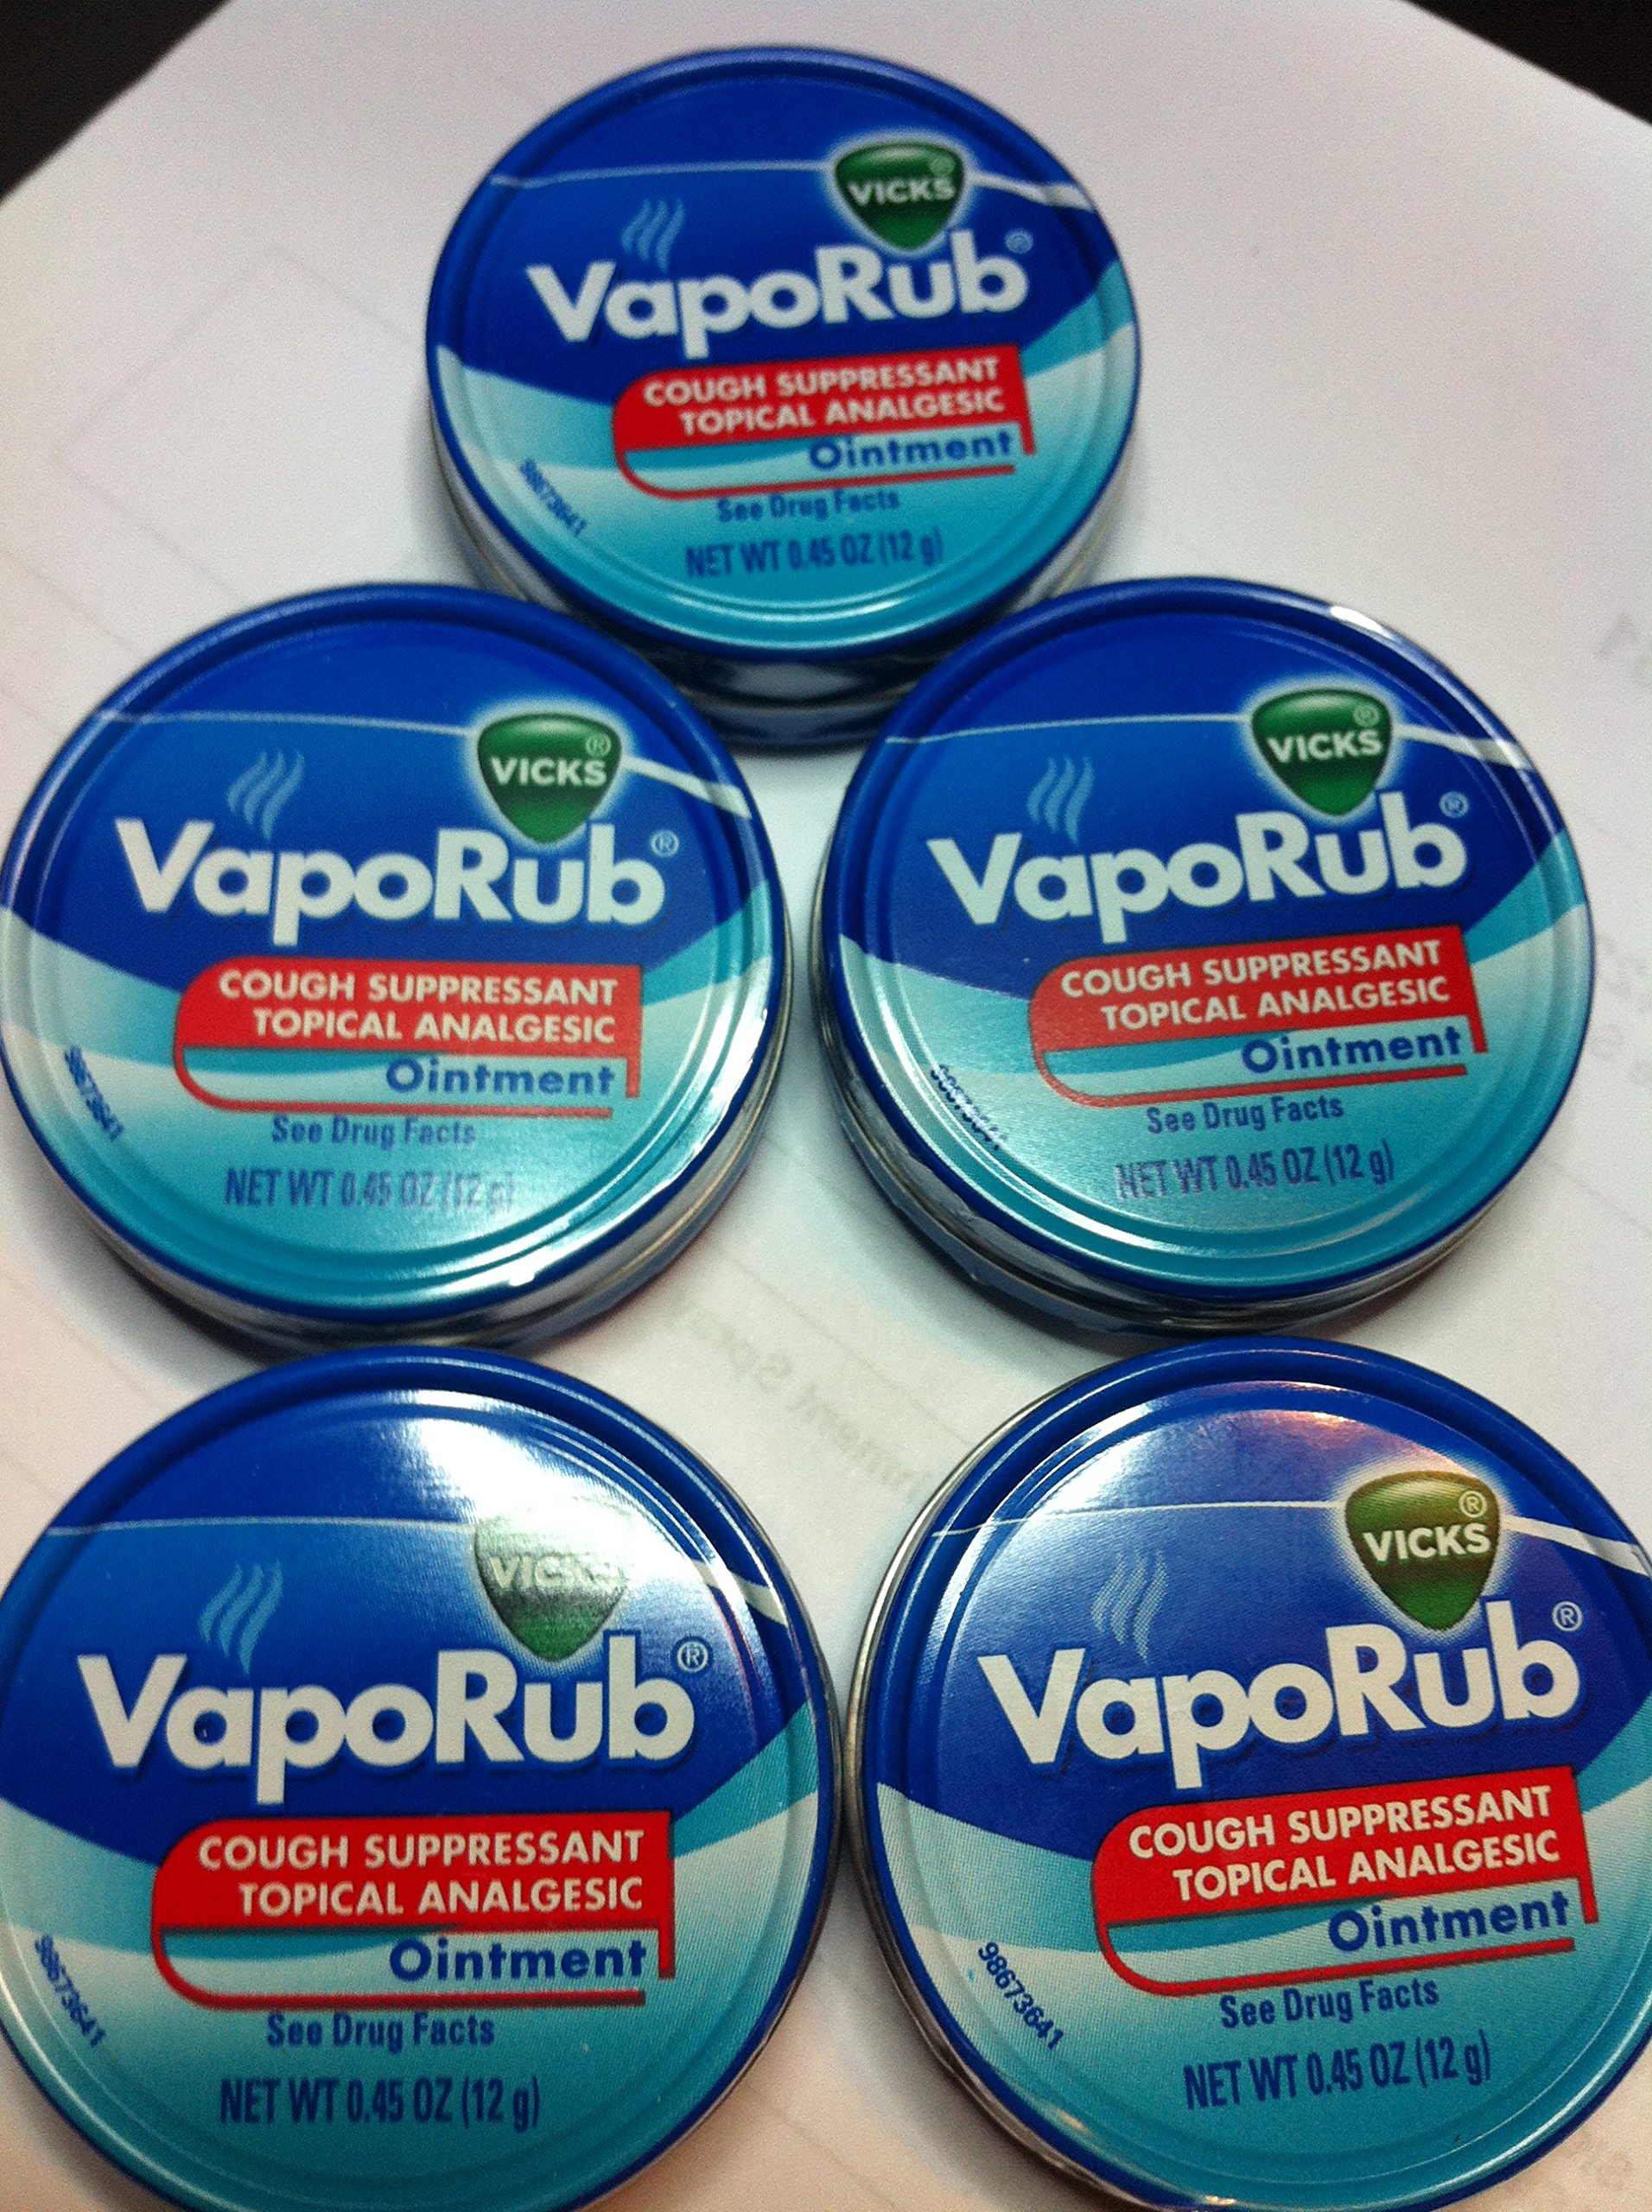 vicks vapor rub vs icy hot